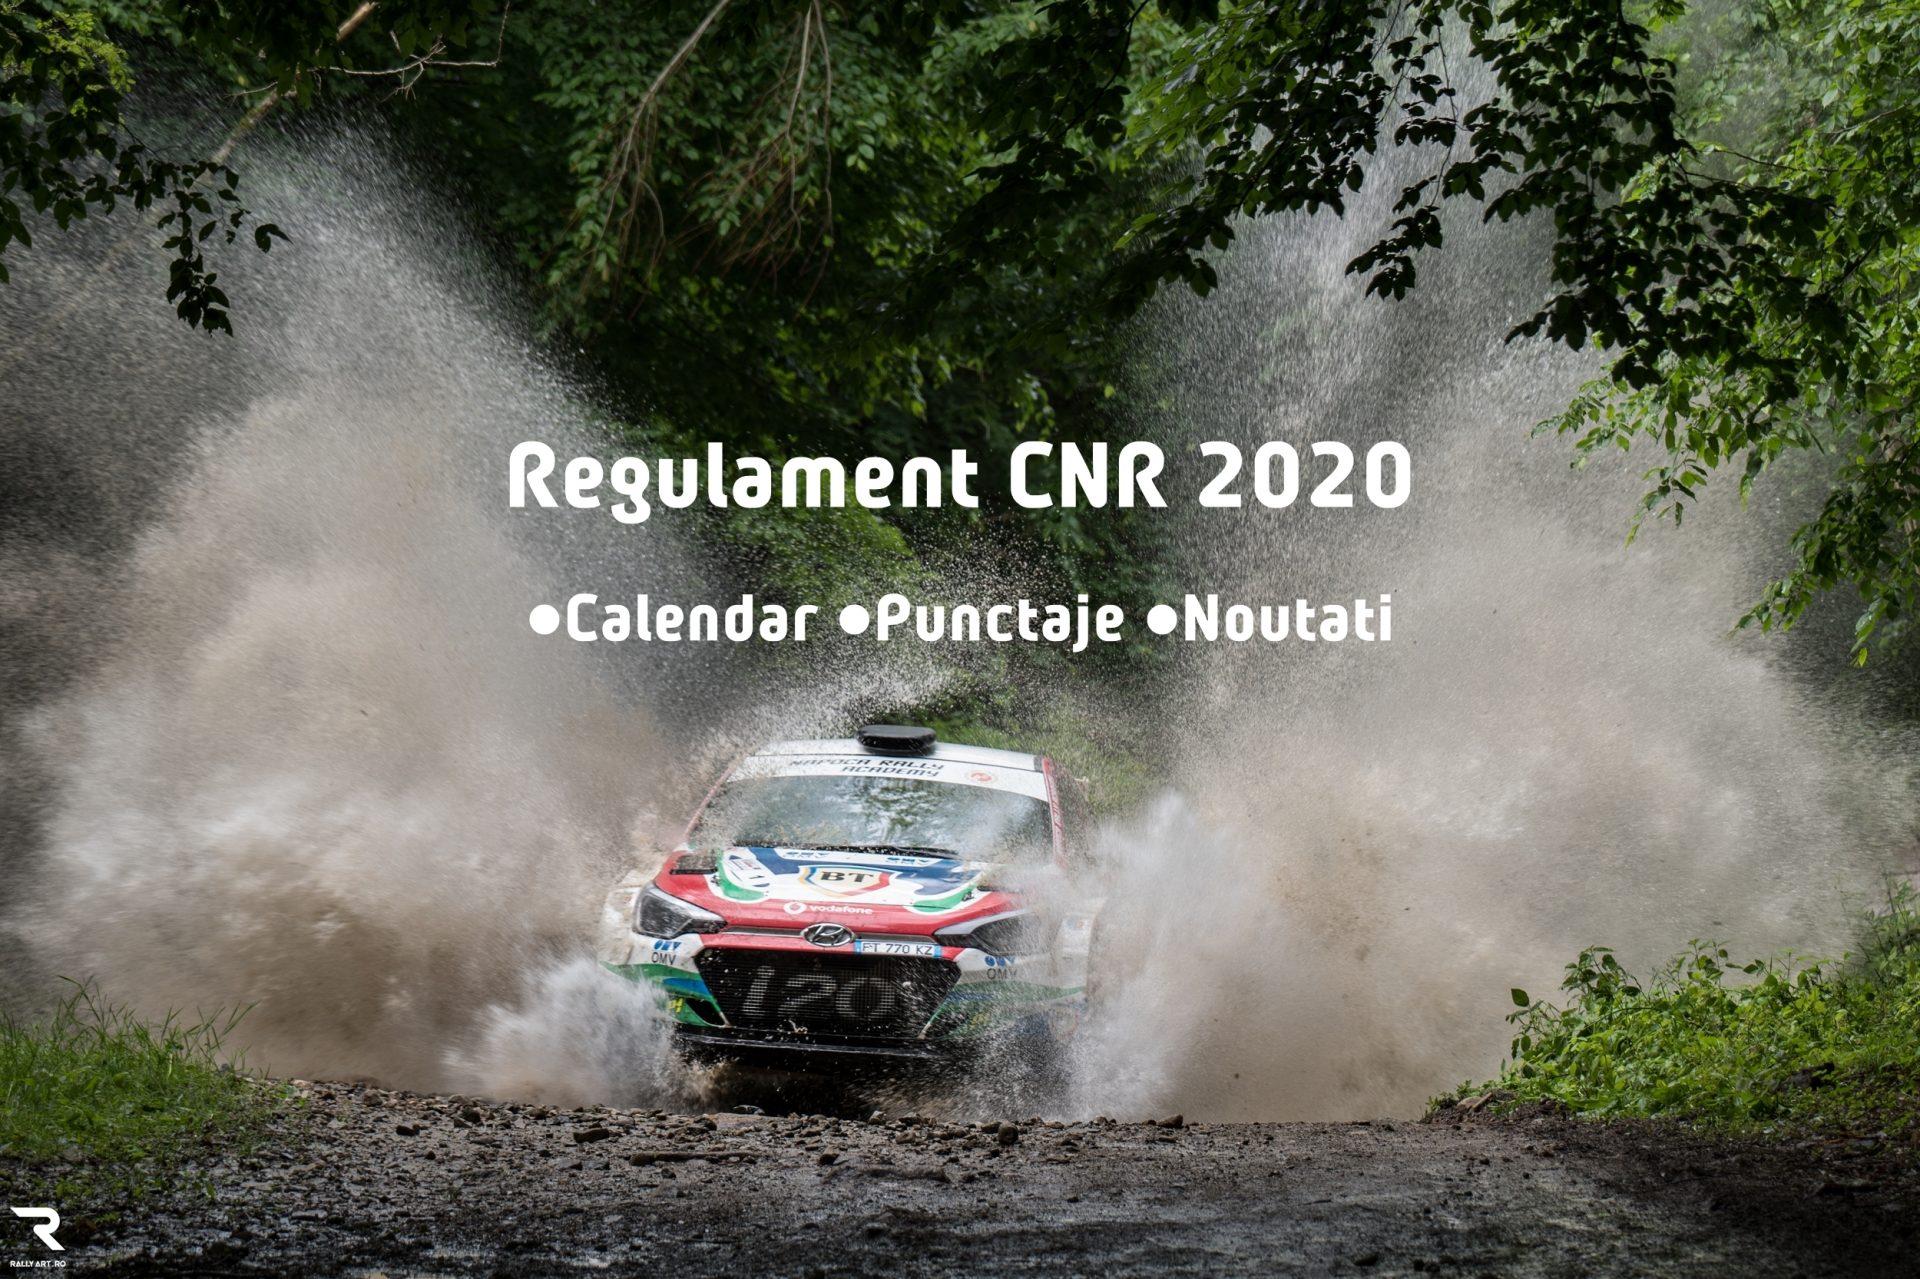 Schimbari de regulament in 2020 in Campionatul National de Raliuri